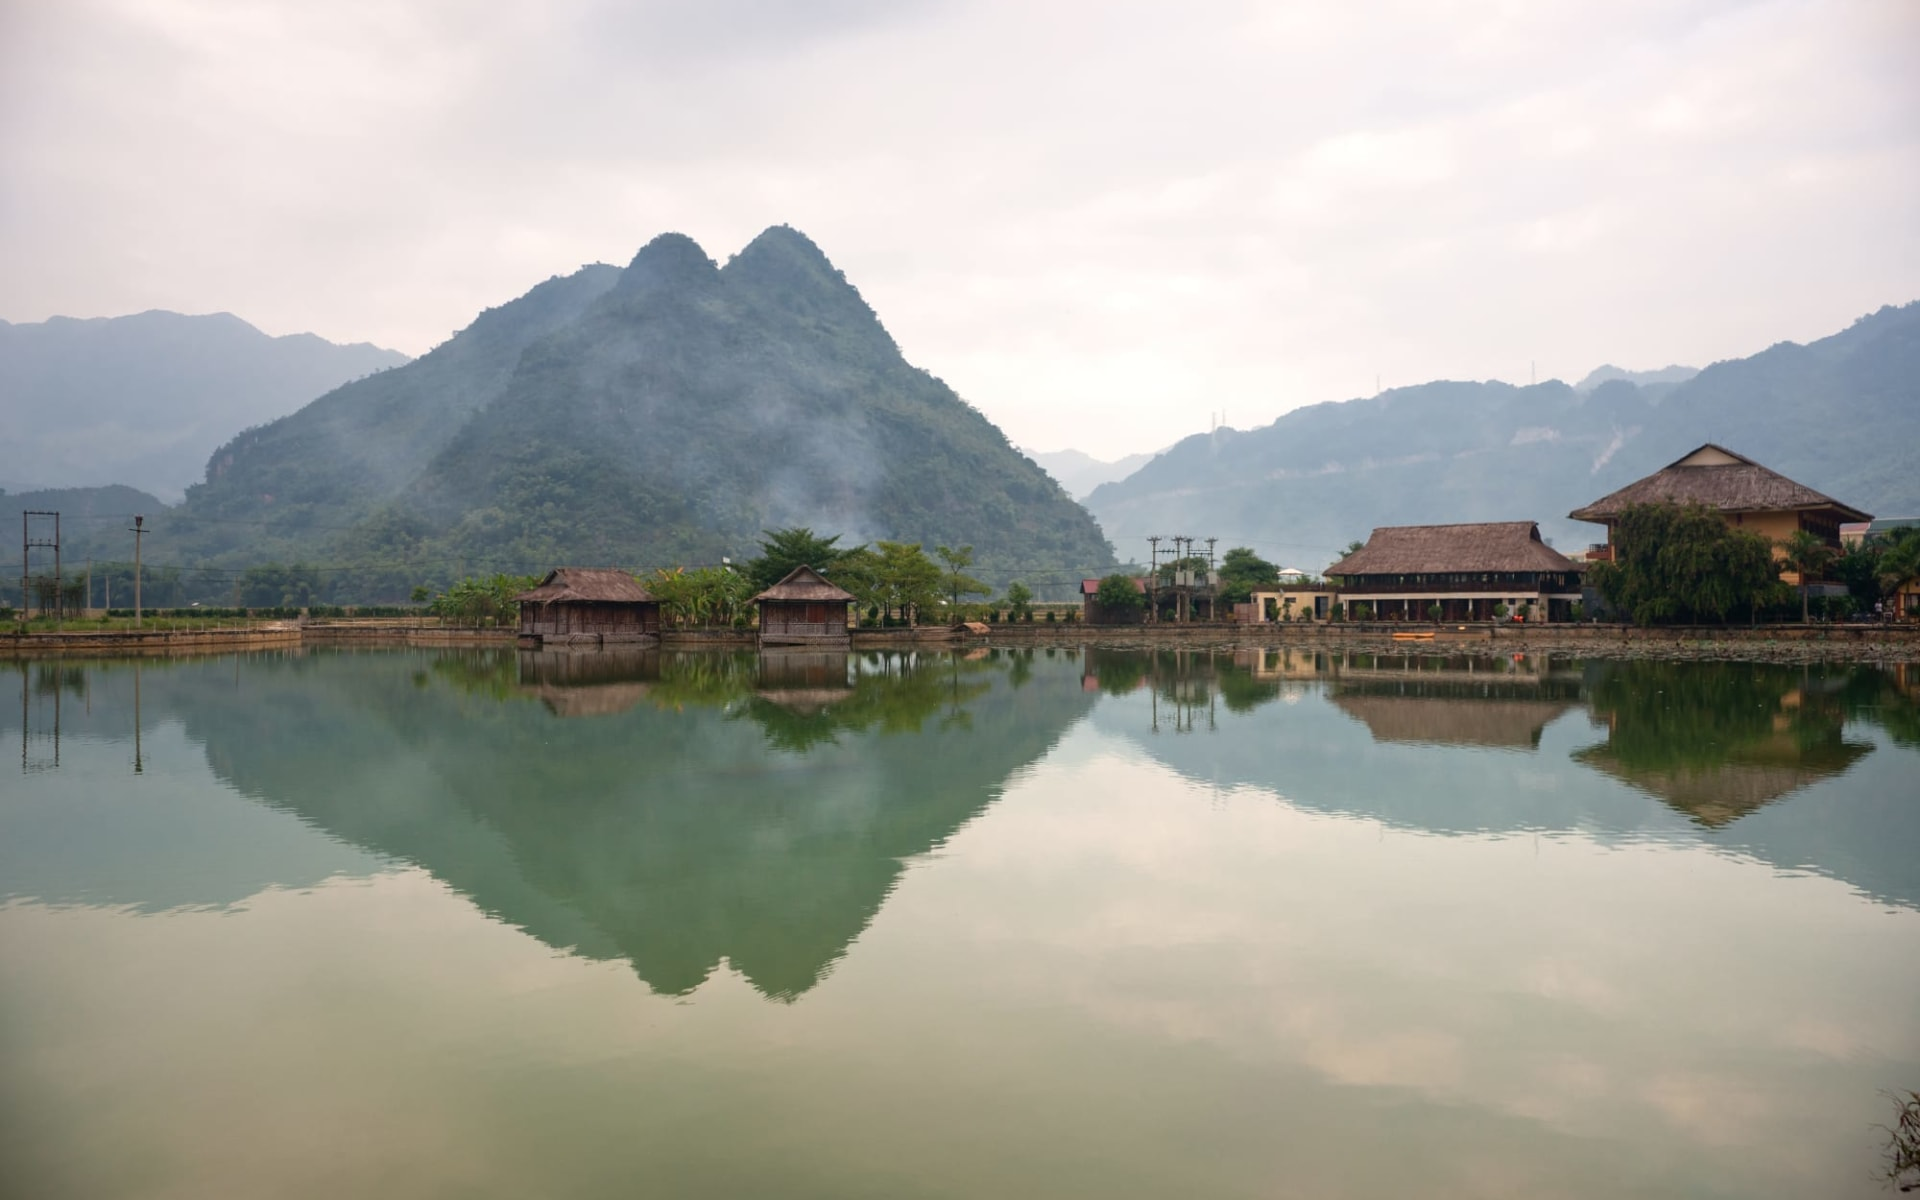 Impressionen Nordvietnams & Halong Bay Kreuzfahrt ab Hanoi: Beautiful panorama in Mai Chau Valley